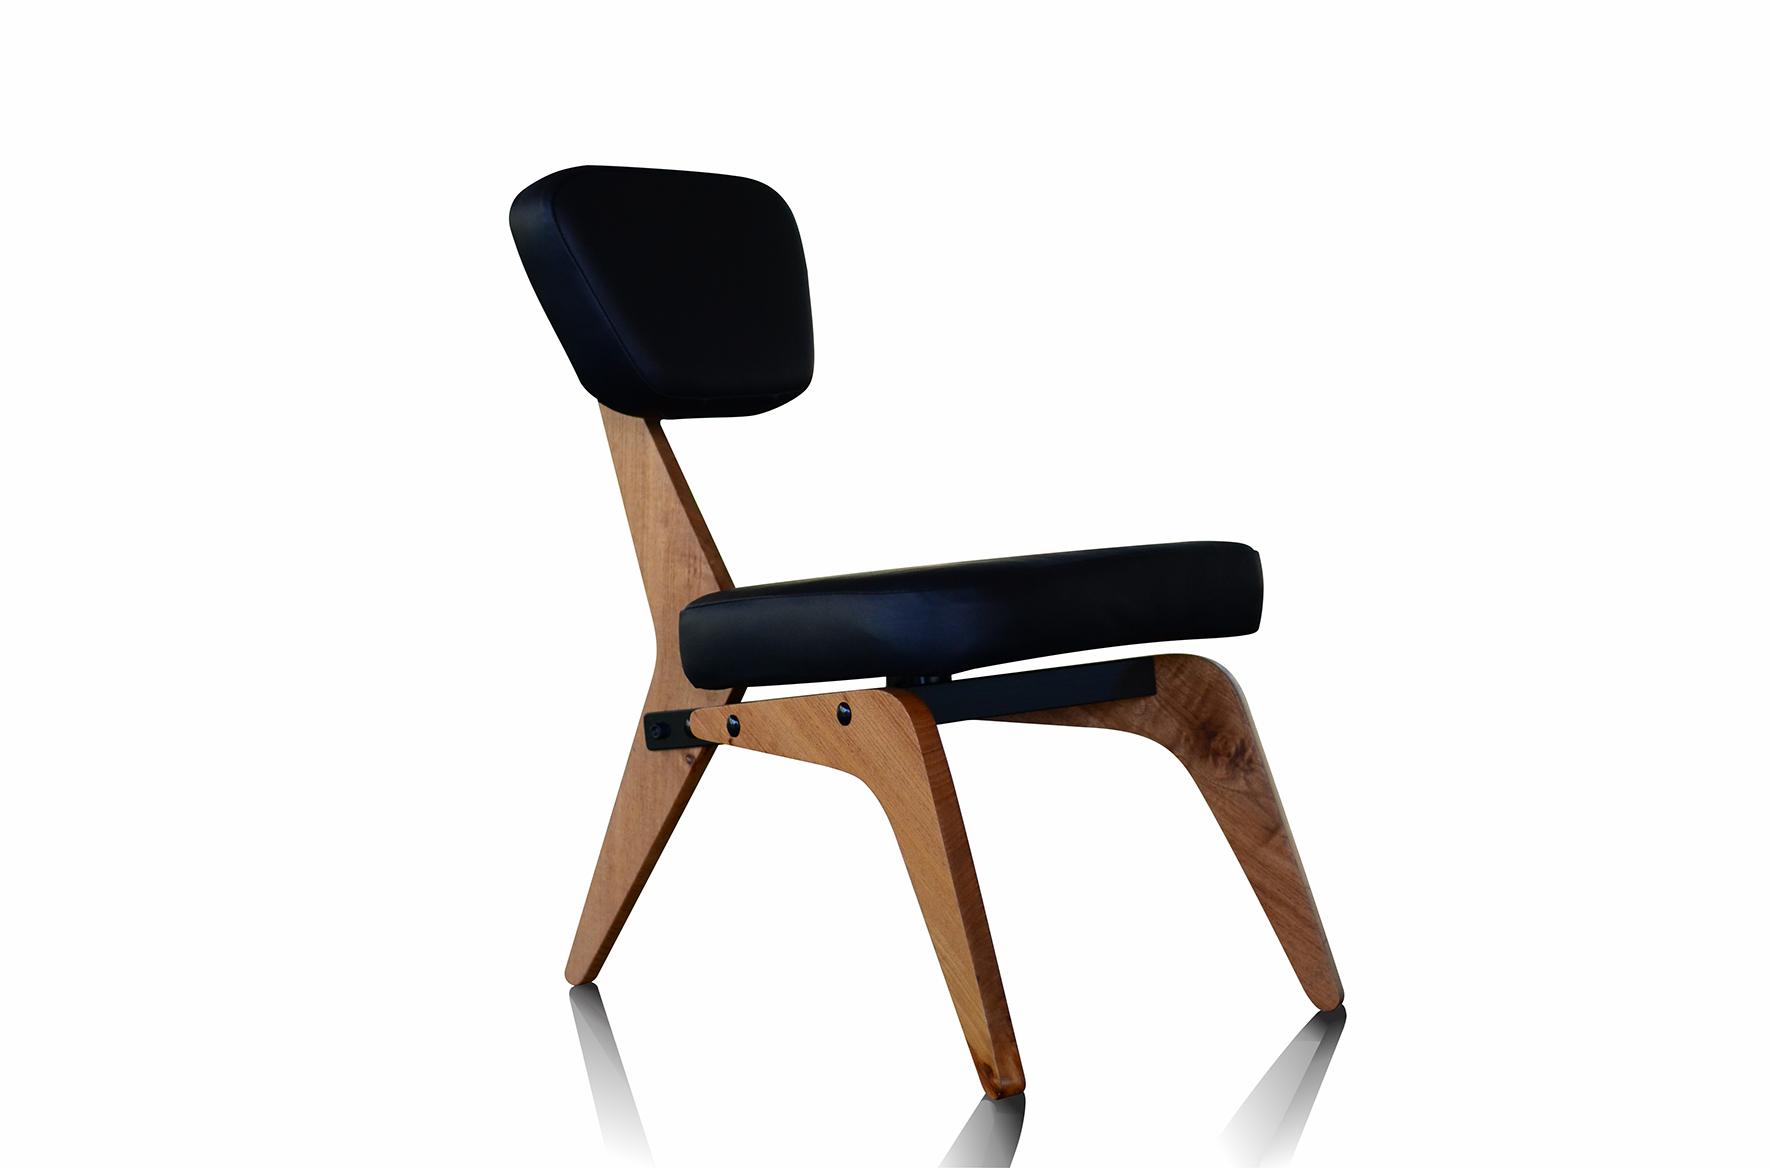 Foto Boomerang Chair, de Marcelo Bilac